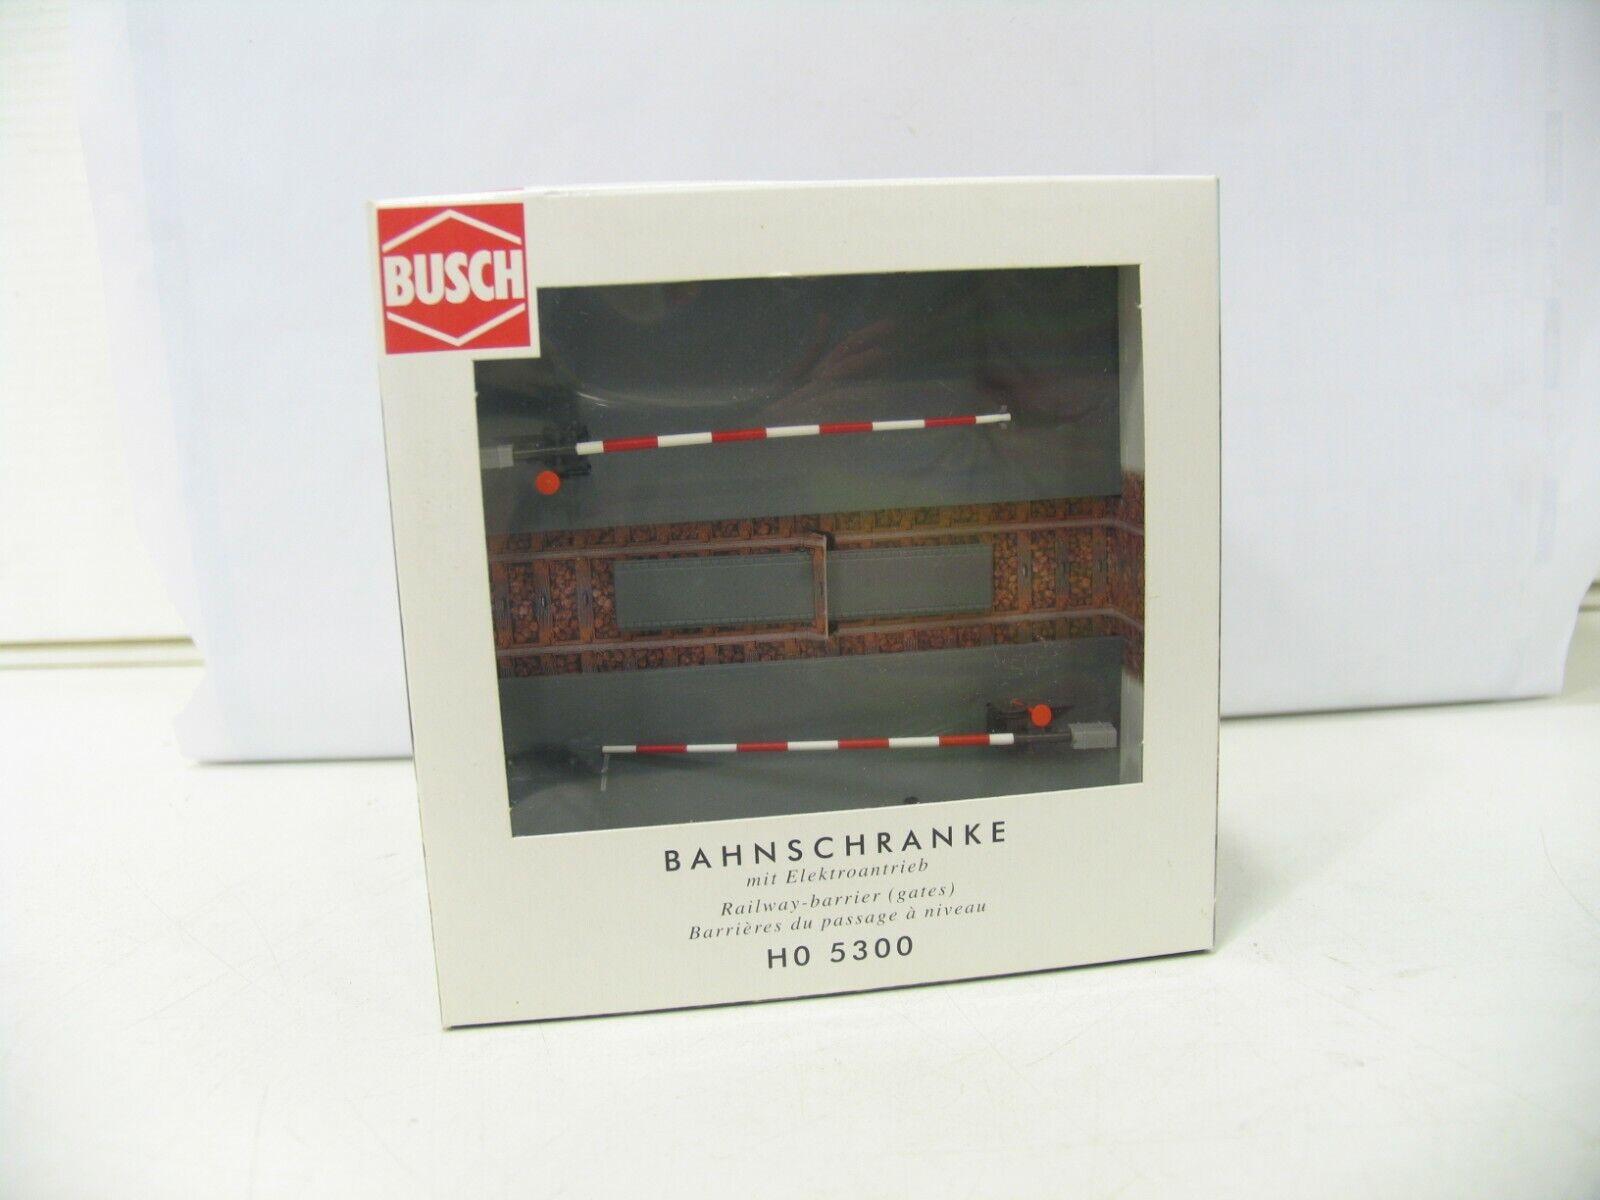 BUSCH HO 5300 BAHNSCHRANKE mit ELEKTROANTRIEB  NH4368